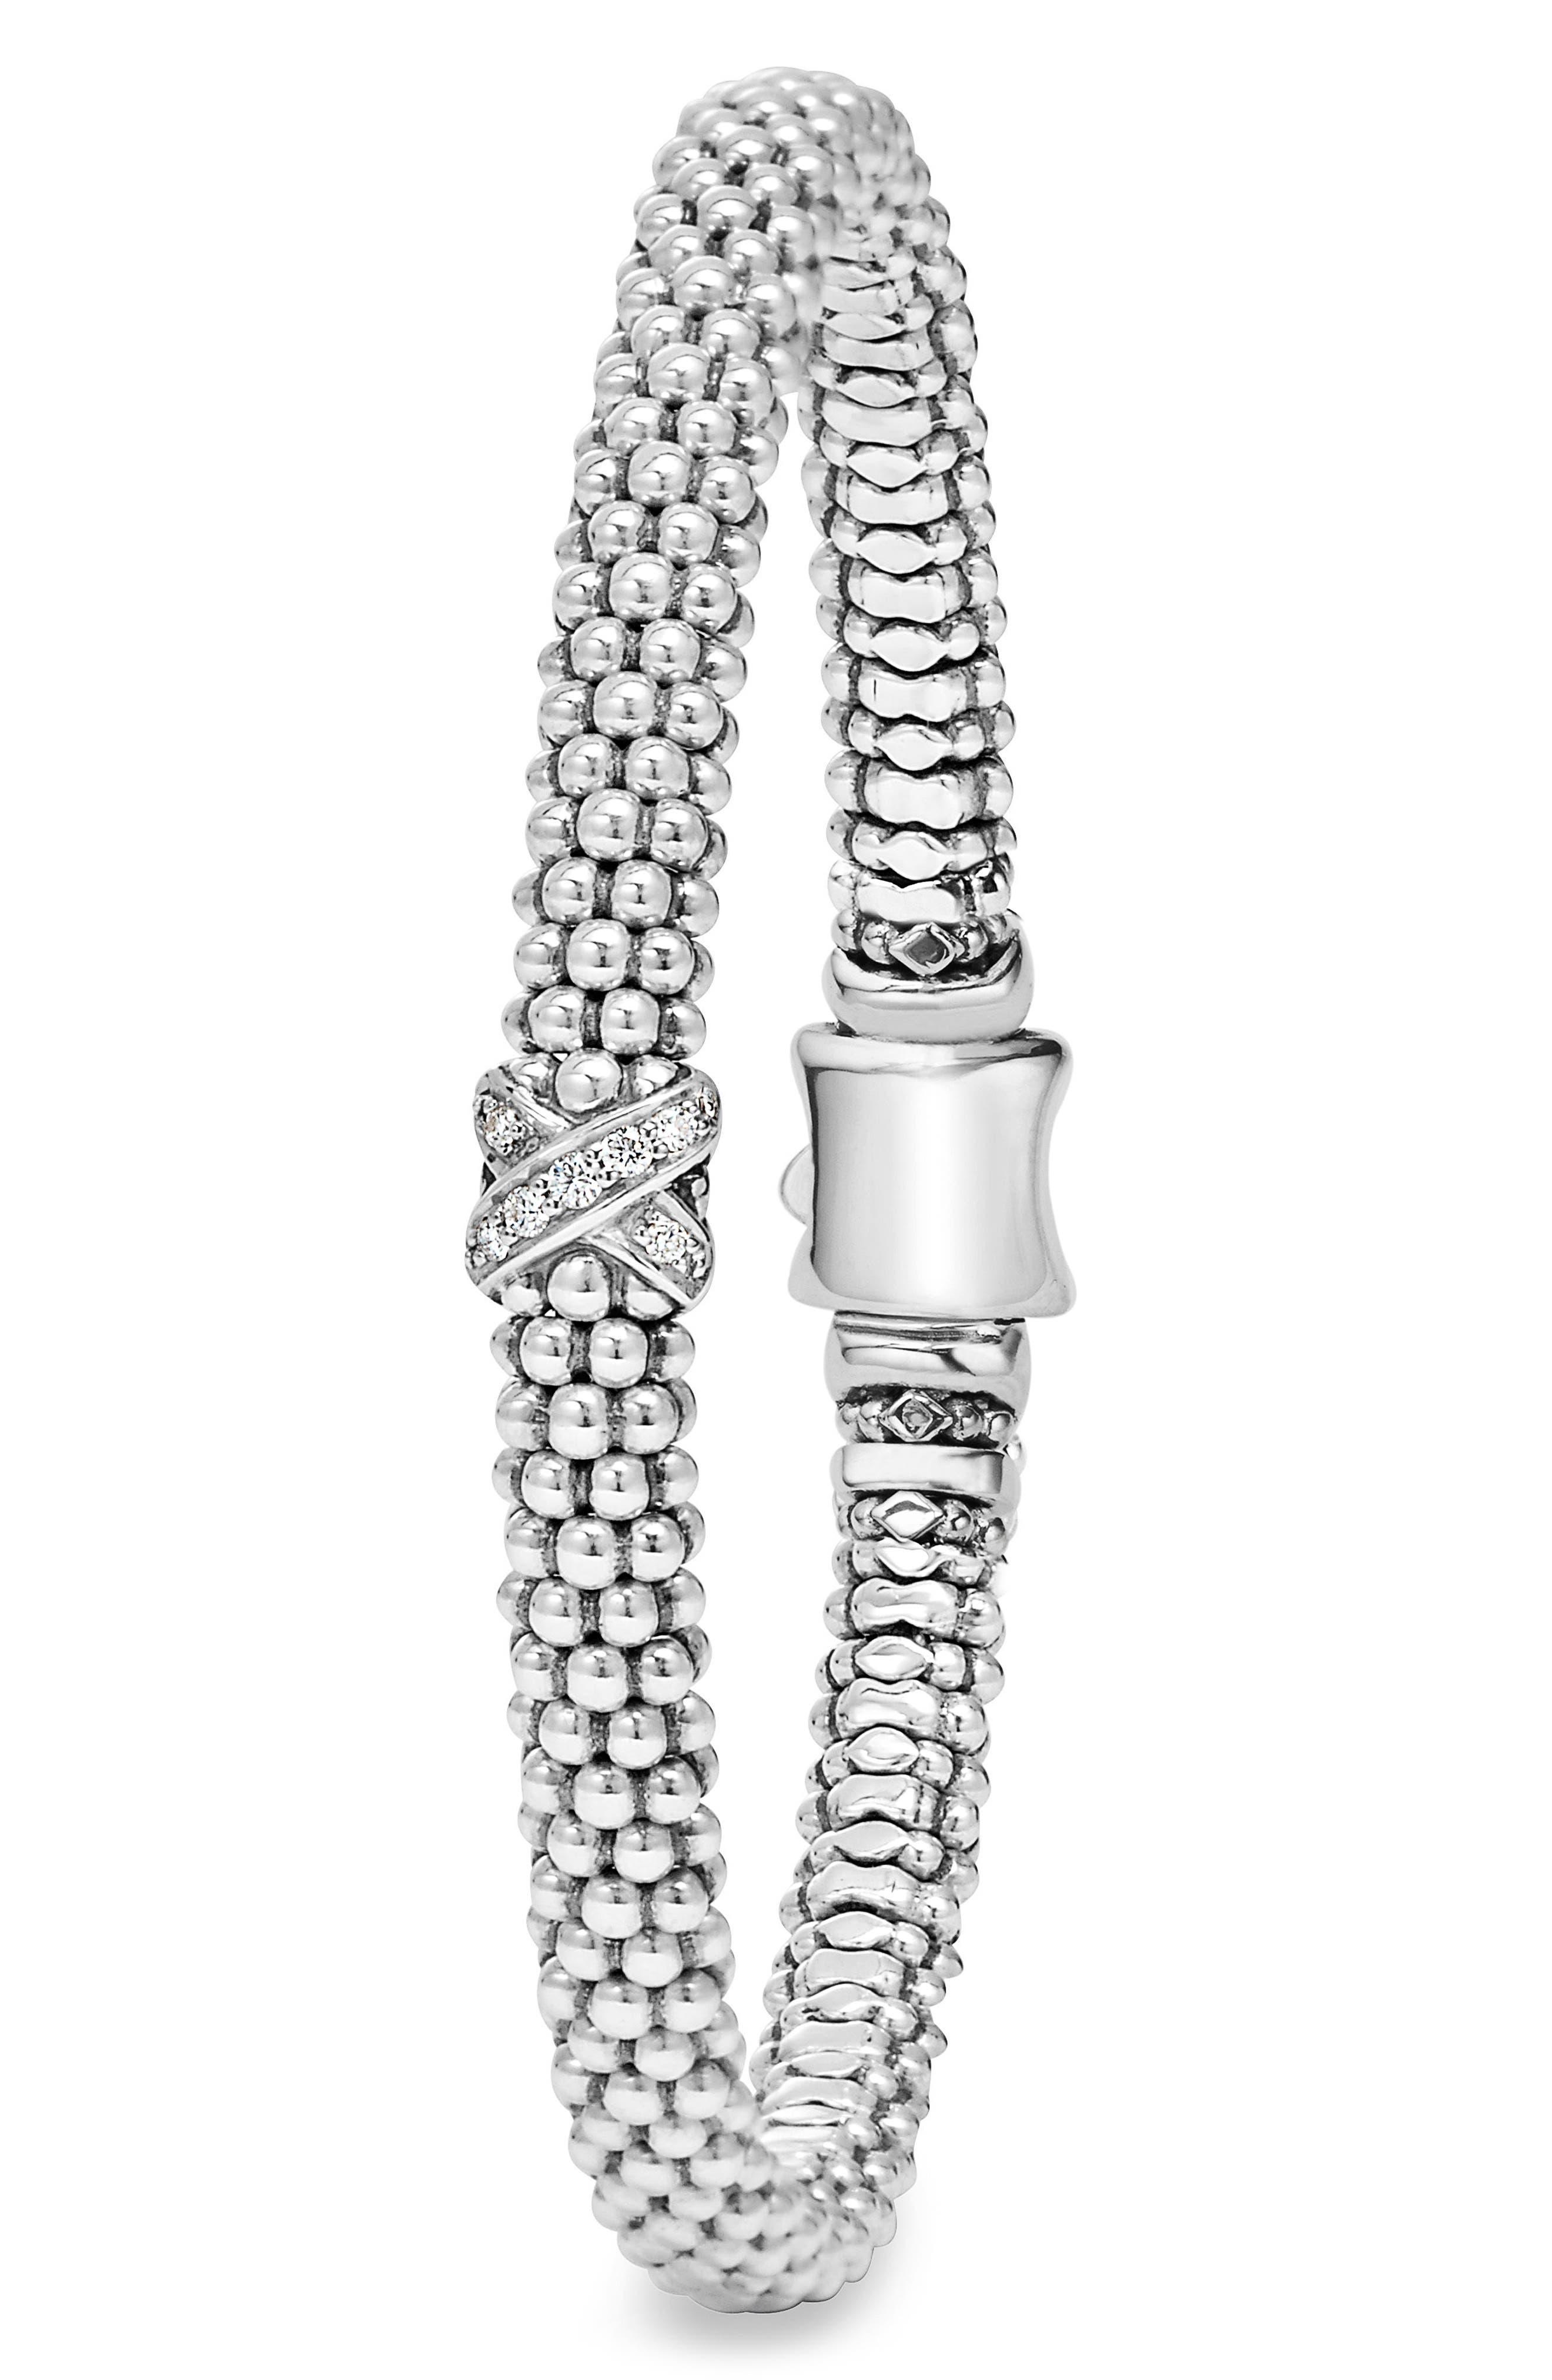 Caviar 'Signature Caviar' Diamond Rope Bracelet,                             Alternate thumbnail 3, color,                             STERLING SILVER